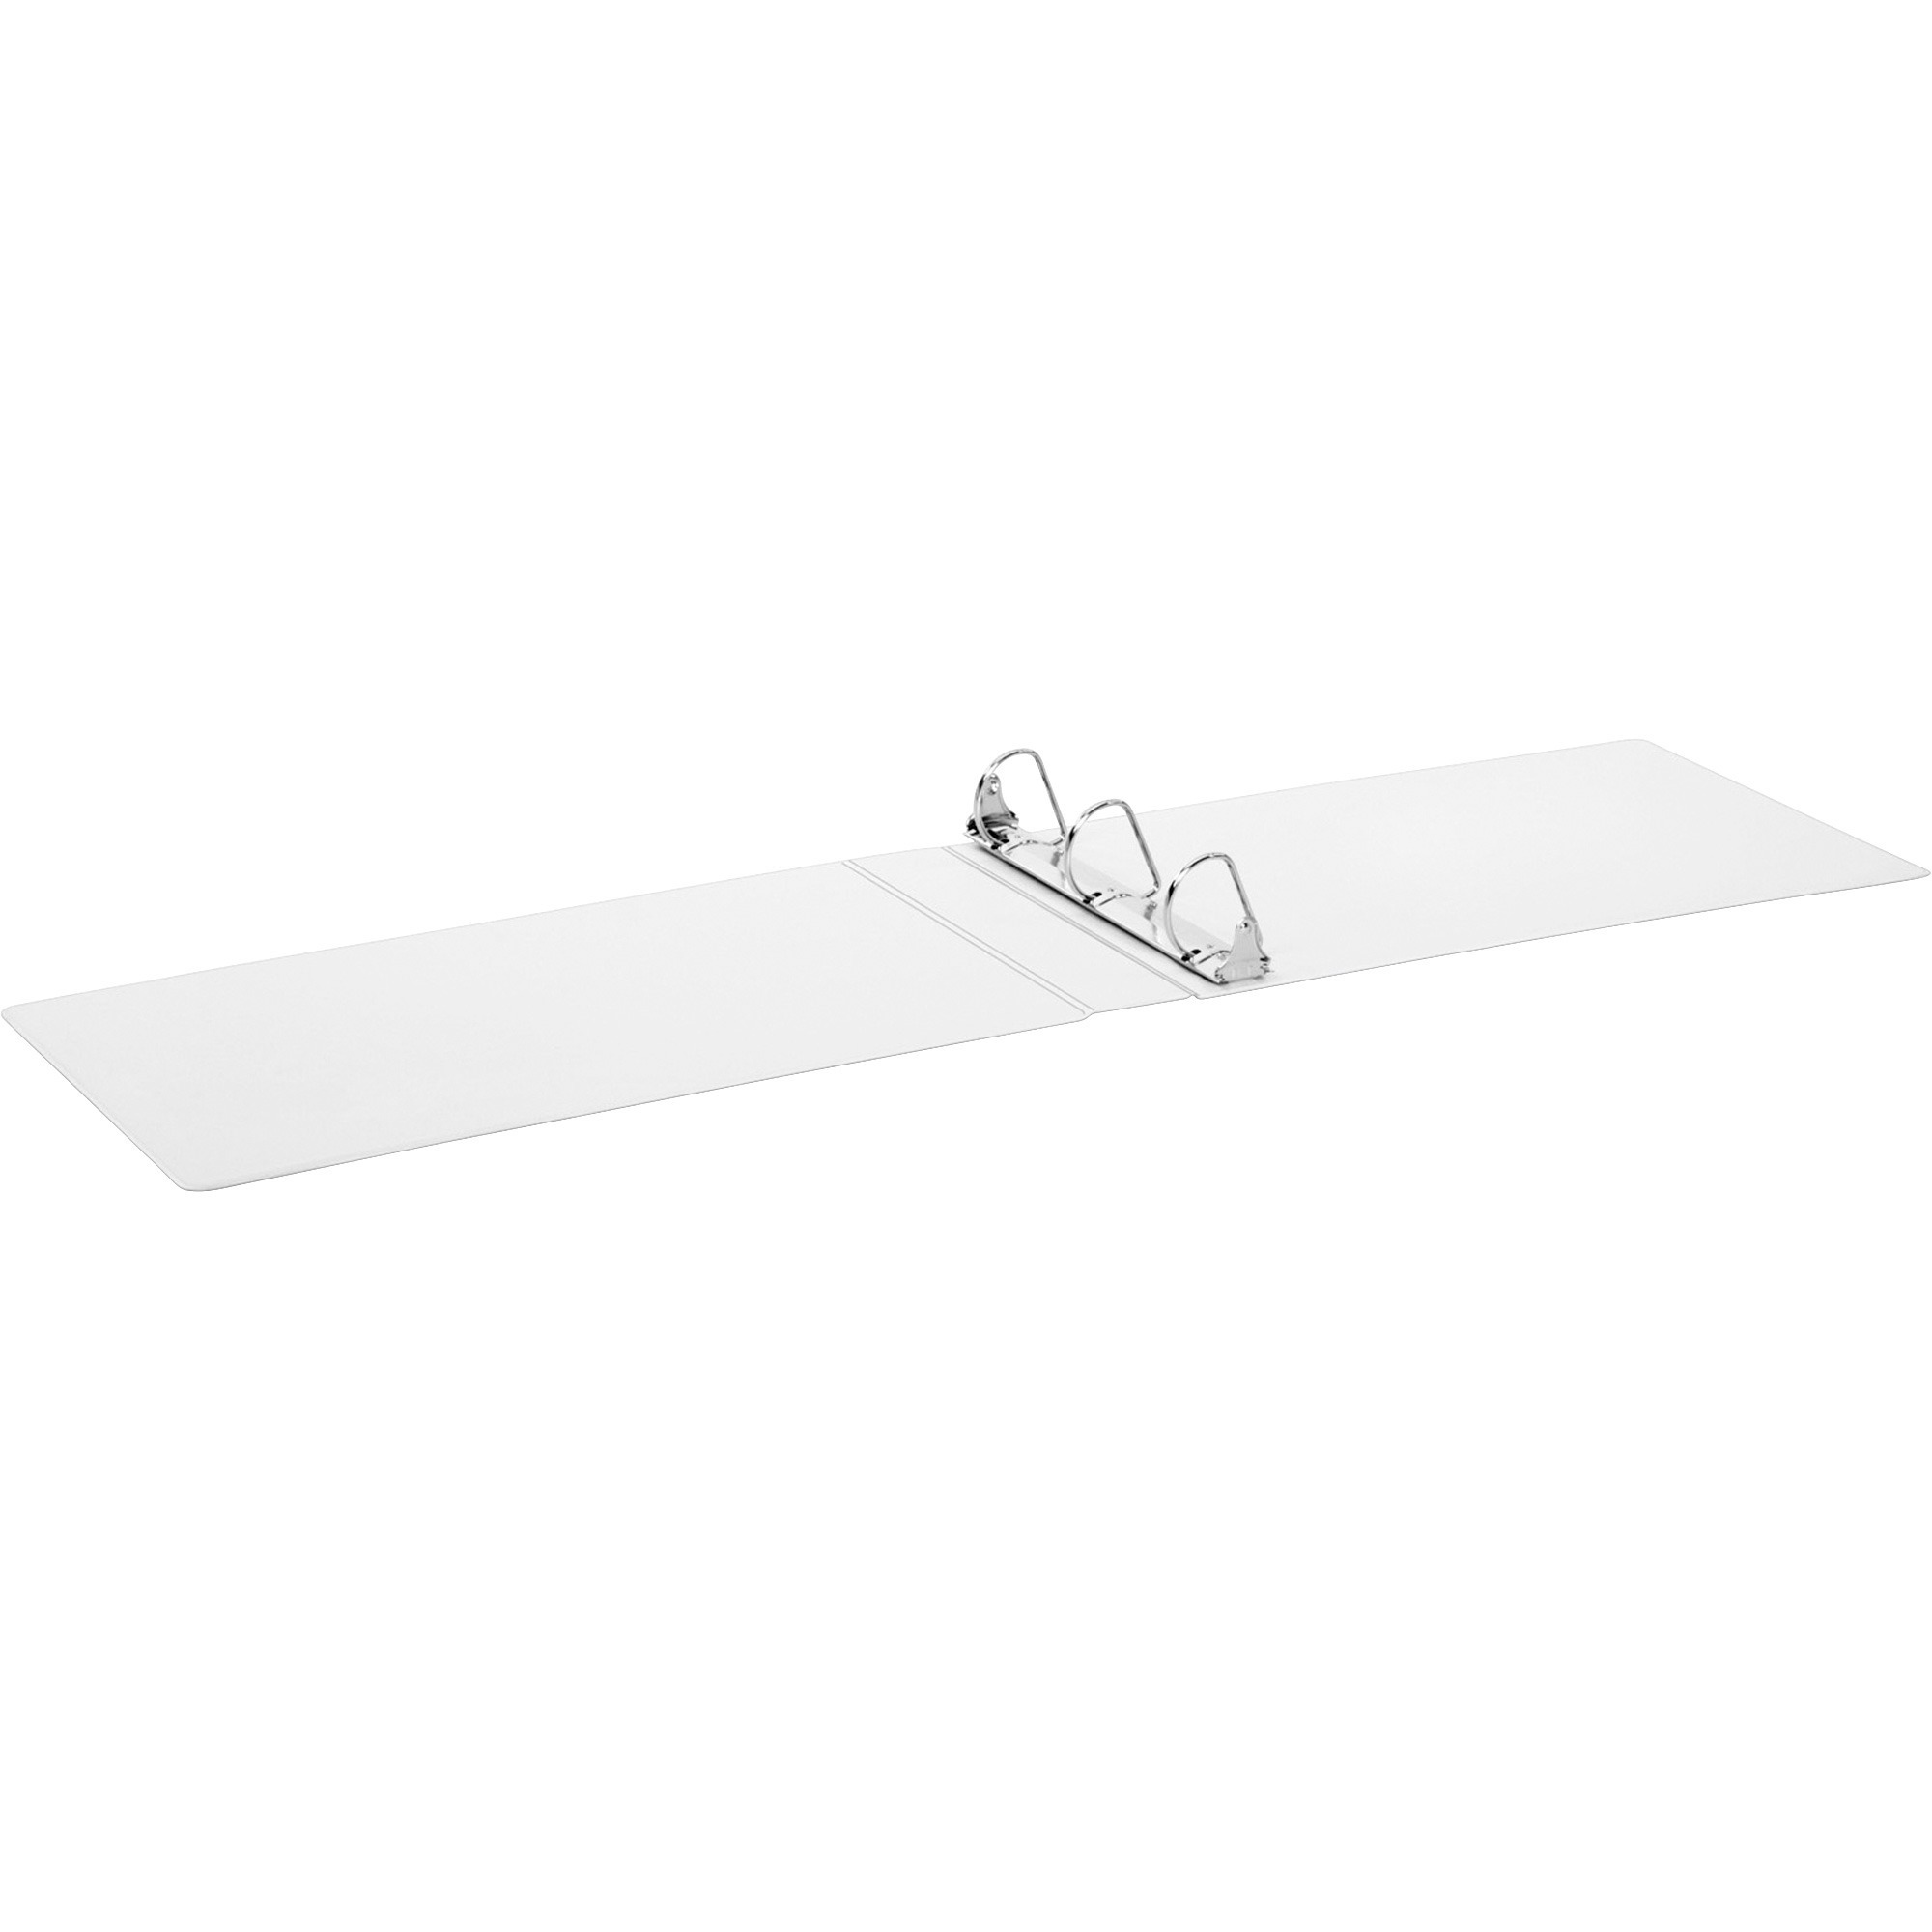 "Cardinal 11 x 17 ClearVue Slant-D Ring Binder, 2"" Cap, White"